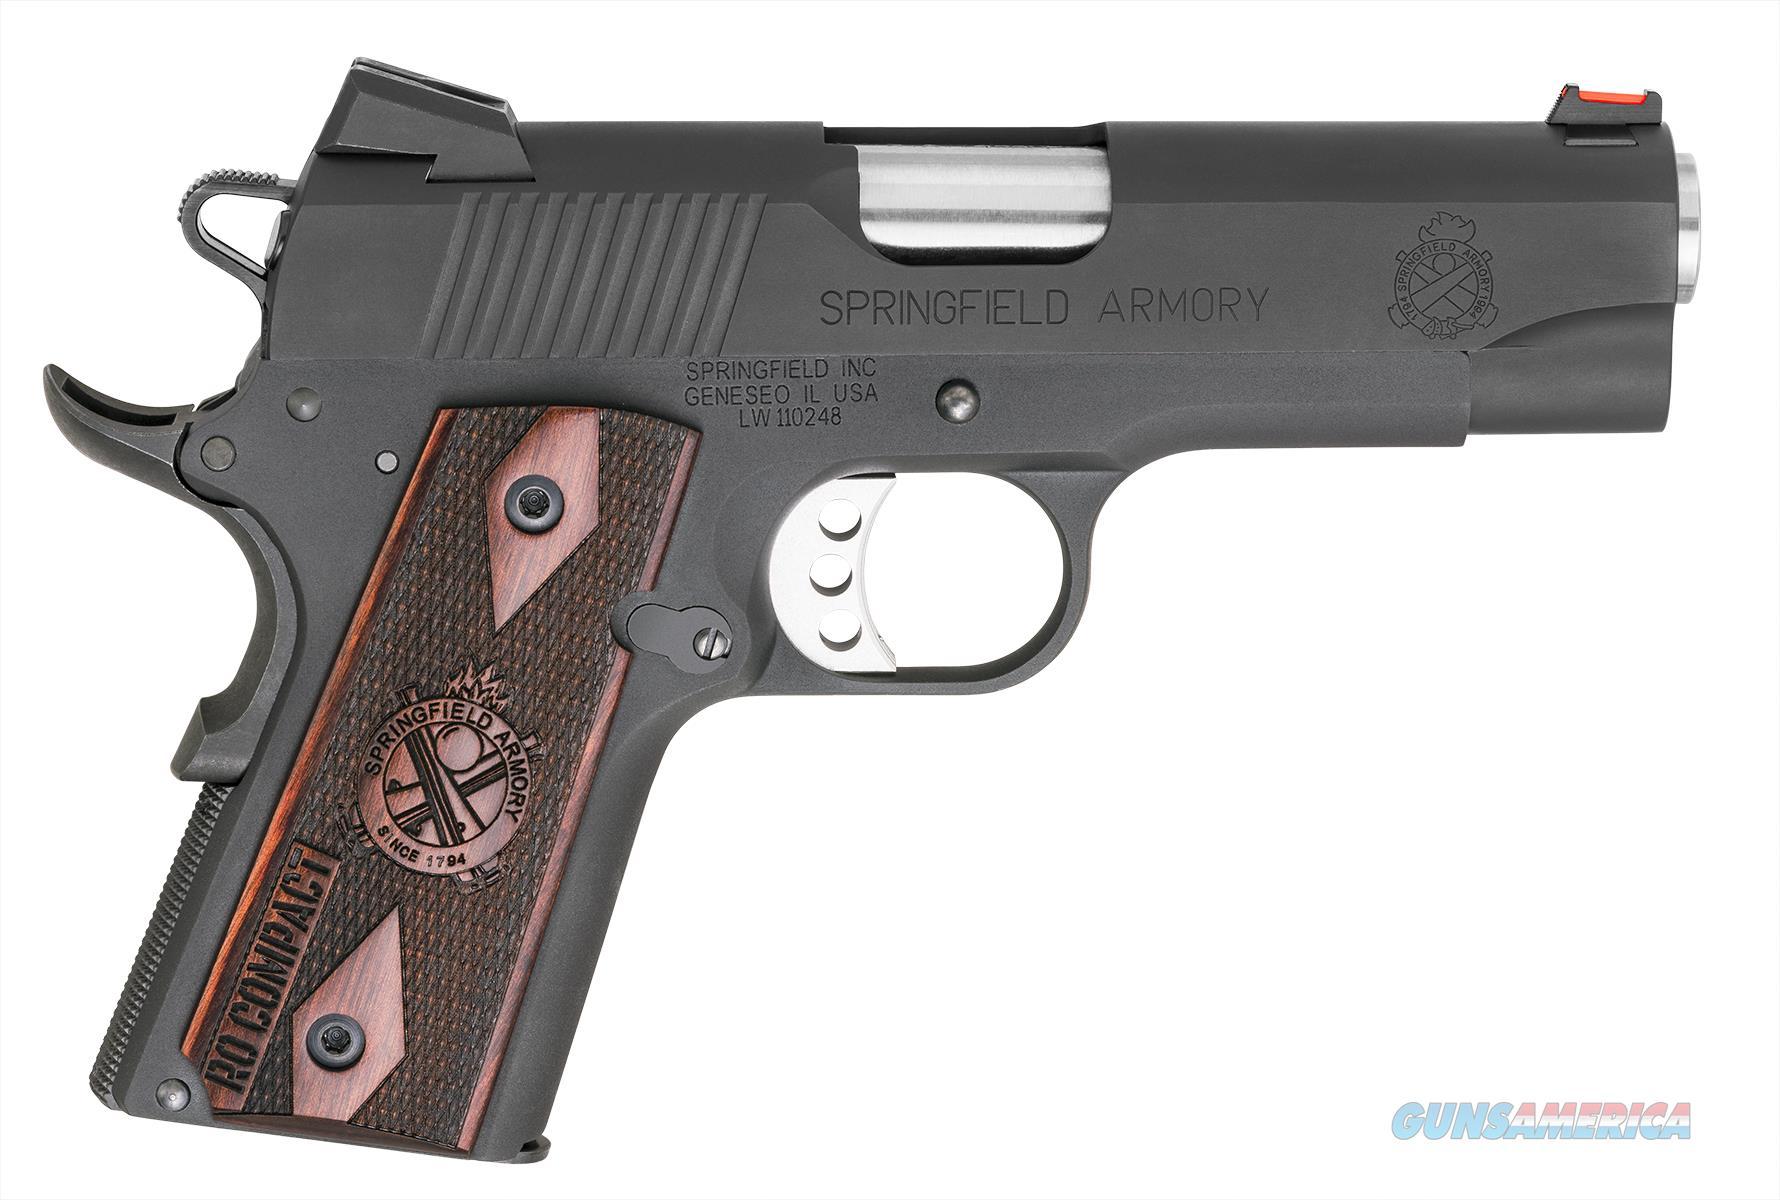 "Springfield 1911 Range Officer Compact .45 ACP 4"" PI9126L   Guns > Pistols > Springfield Armory Pistols > 1911 Type"